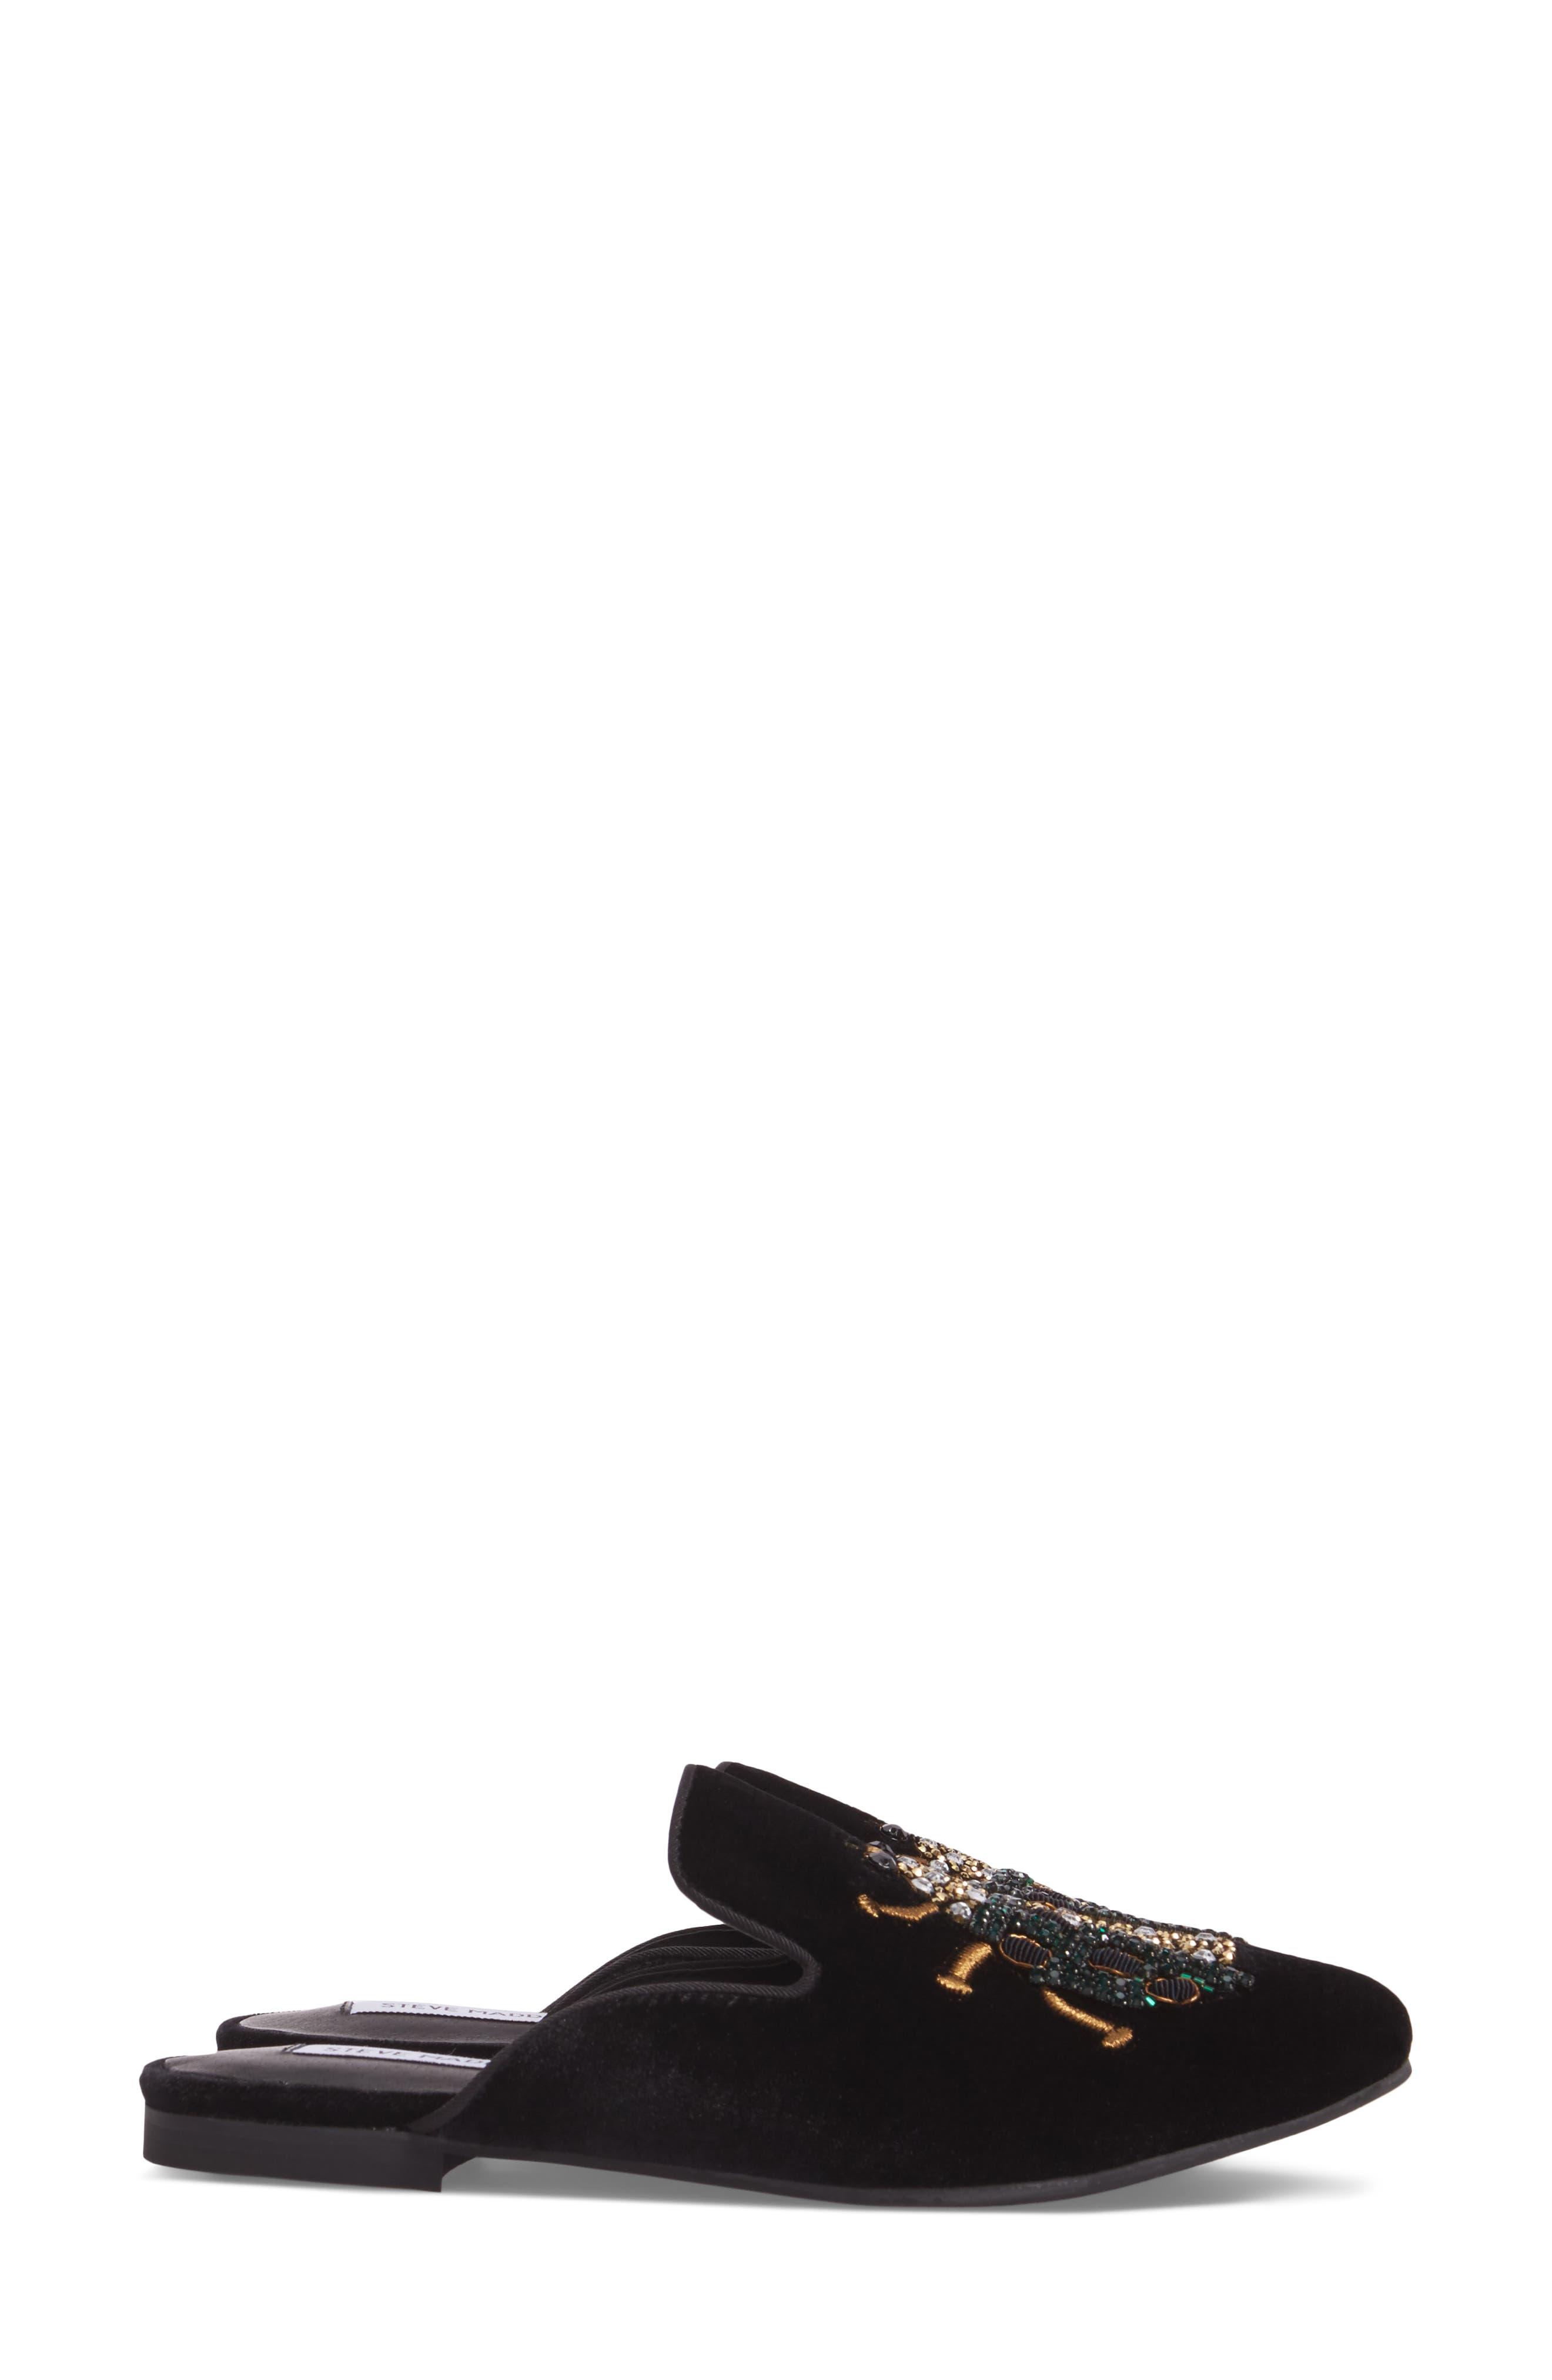 Hugh Embellished Mule,                             Alternate thumbnail 3, color,                             Black Multi Fabric